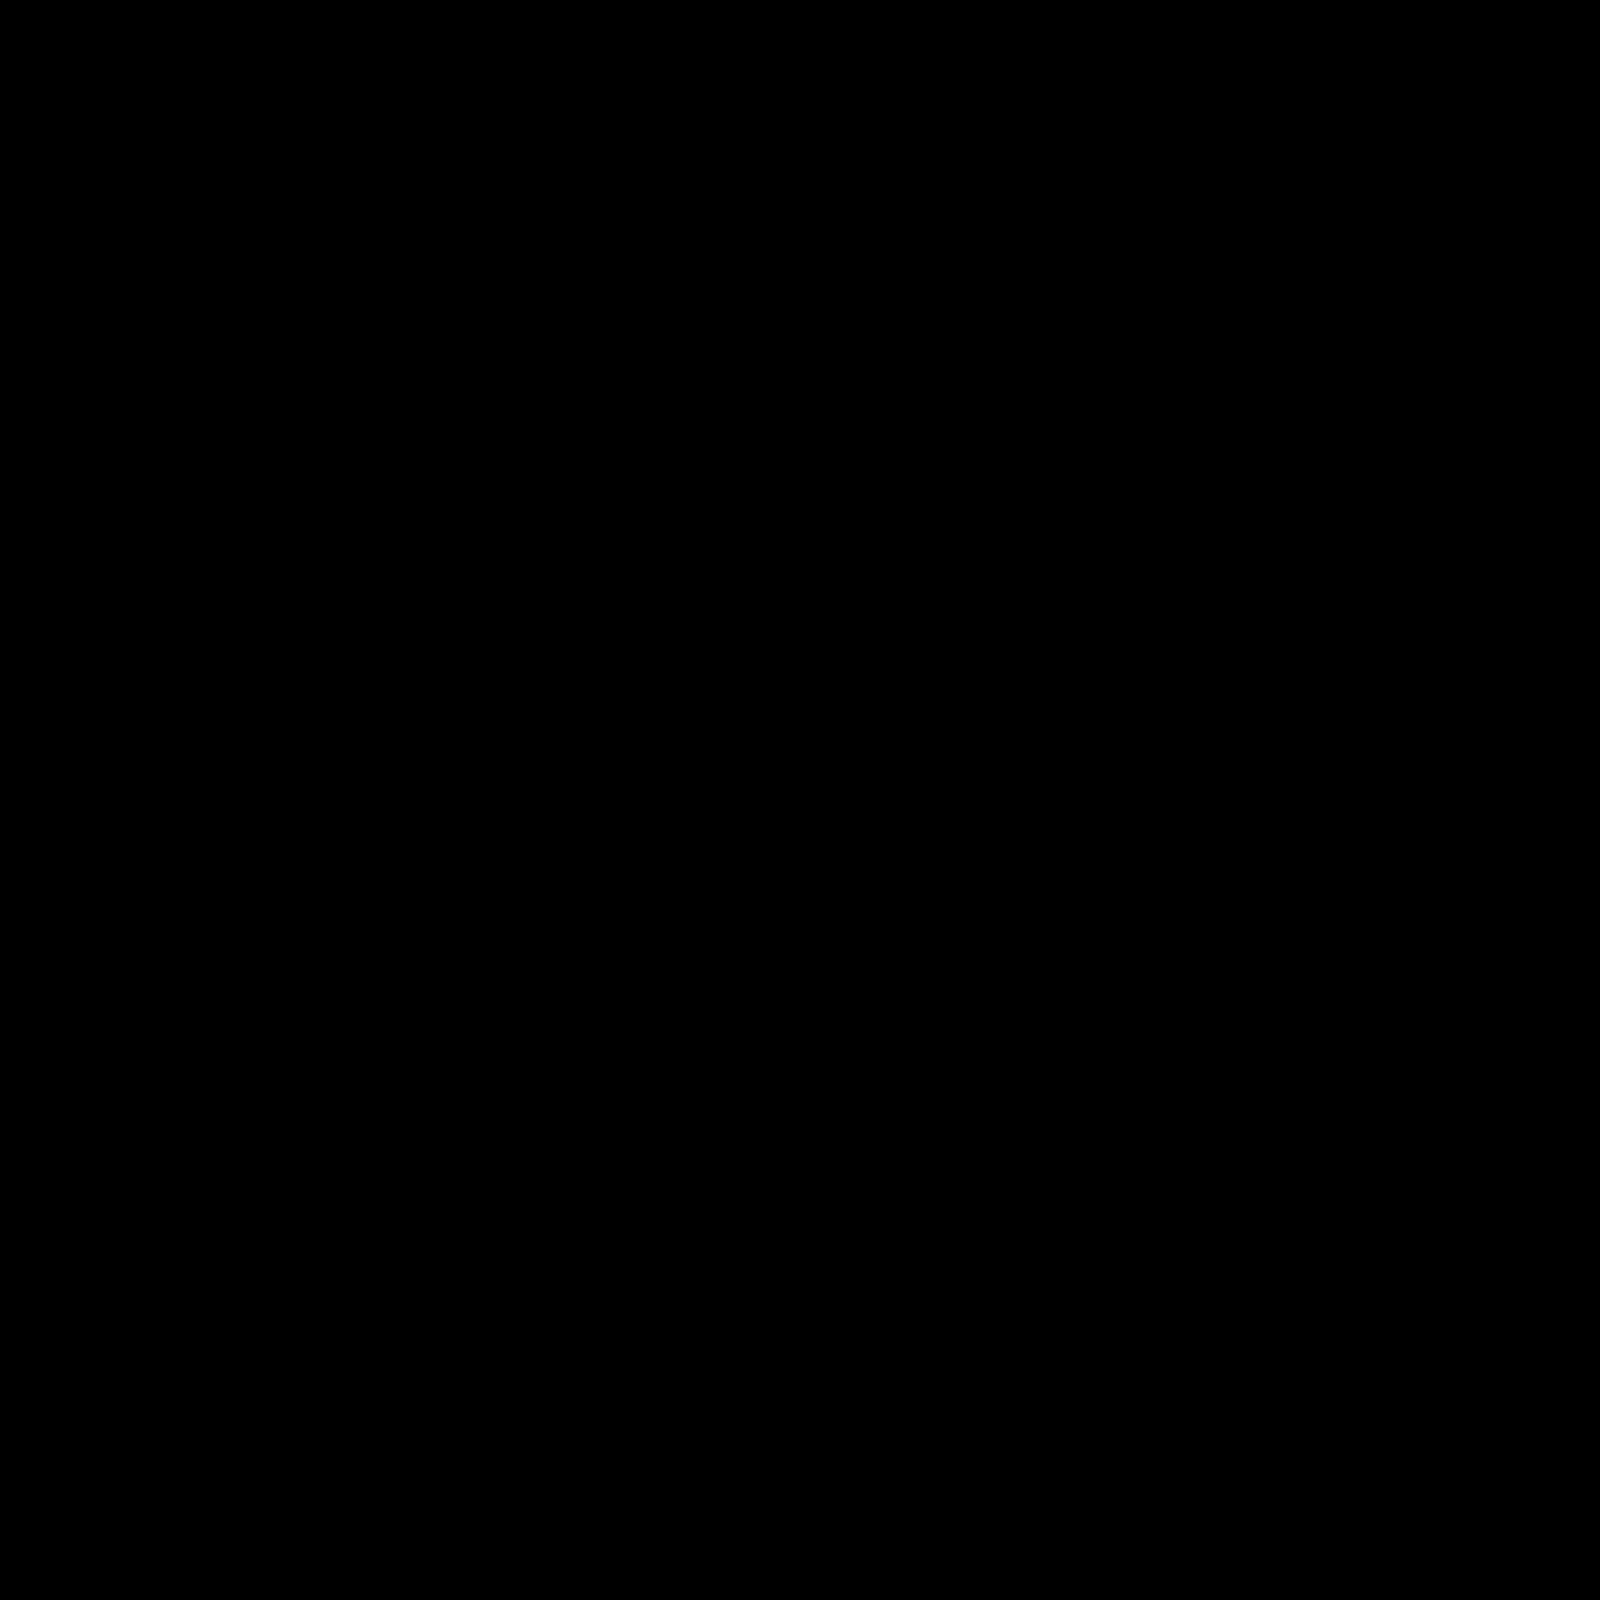 Back Massage Area Filled icon